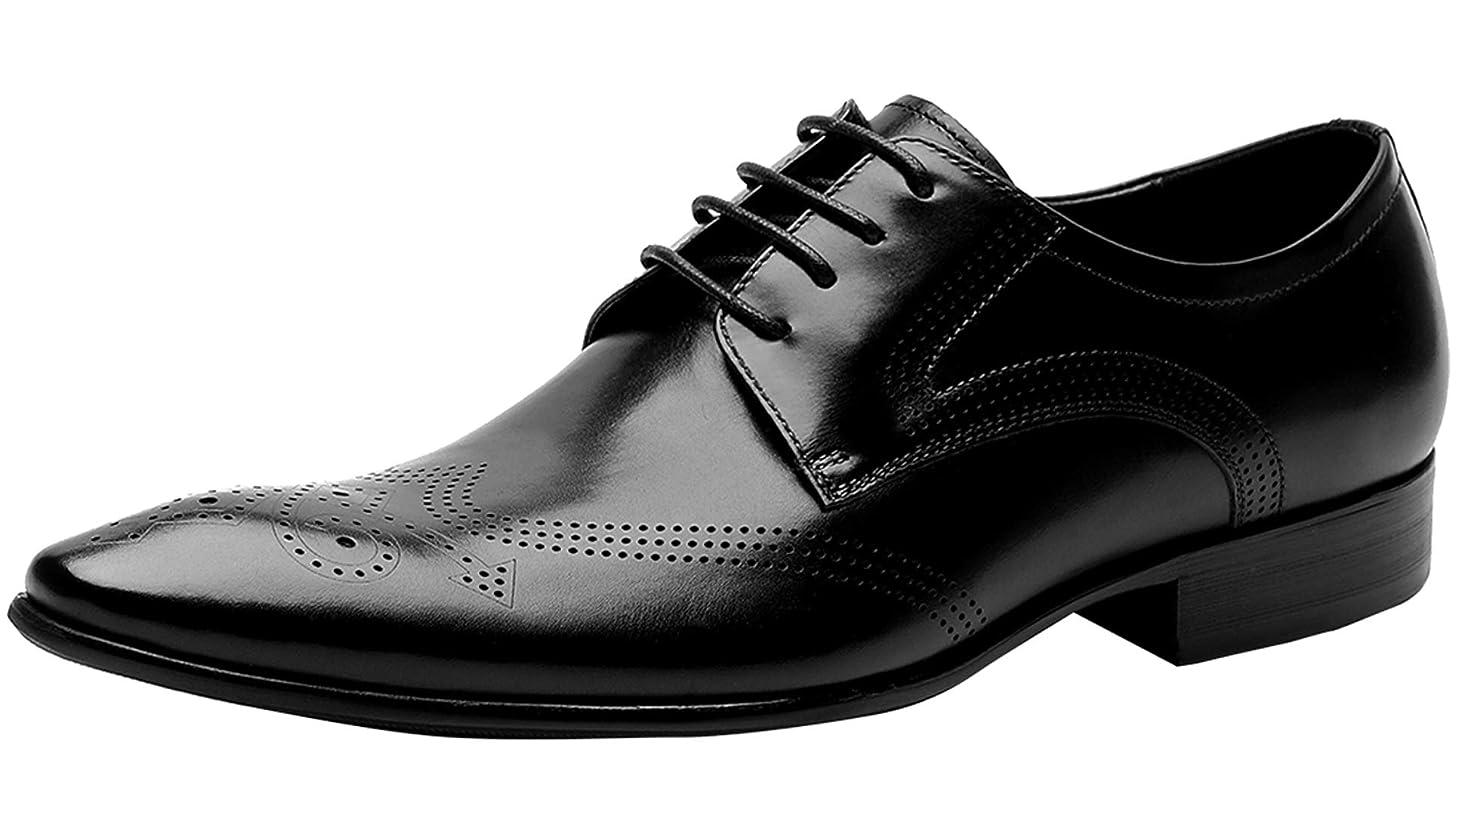 Mens Oxford Shoes Formal Leather Brogue Mens Dress Shoes - Derby Shoes - Men Wedding Shoes